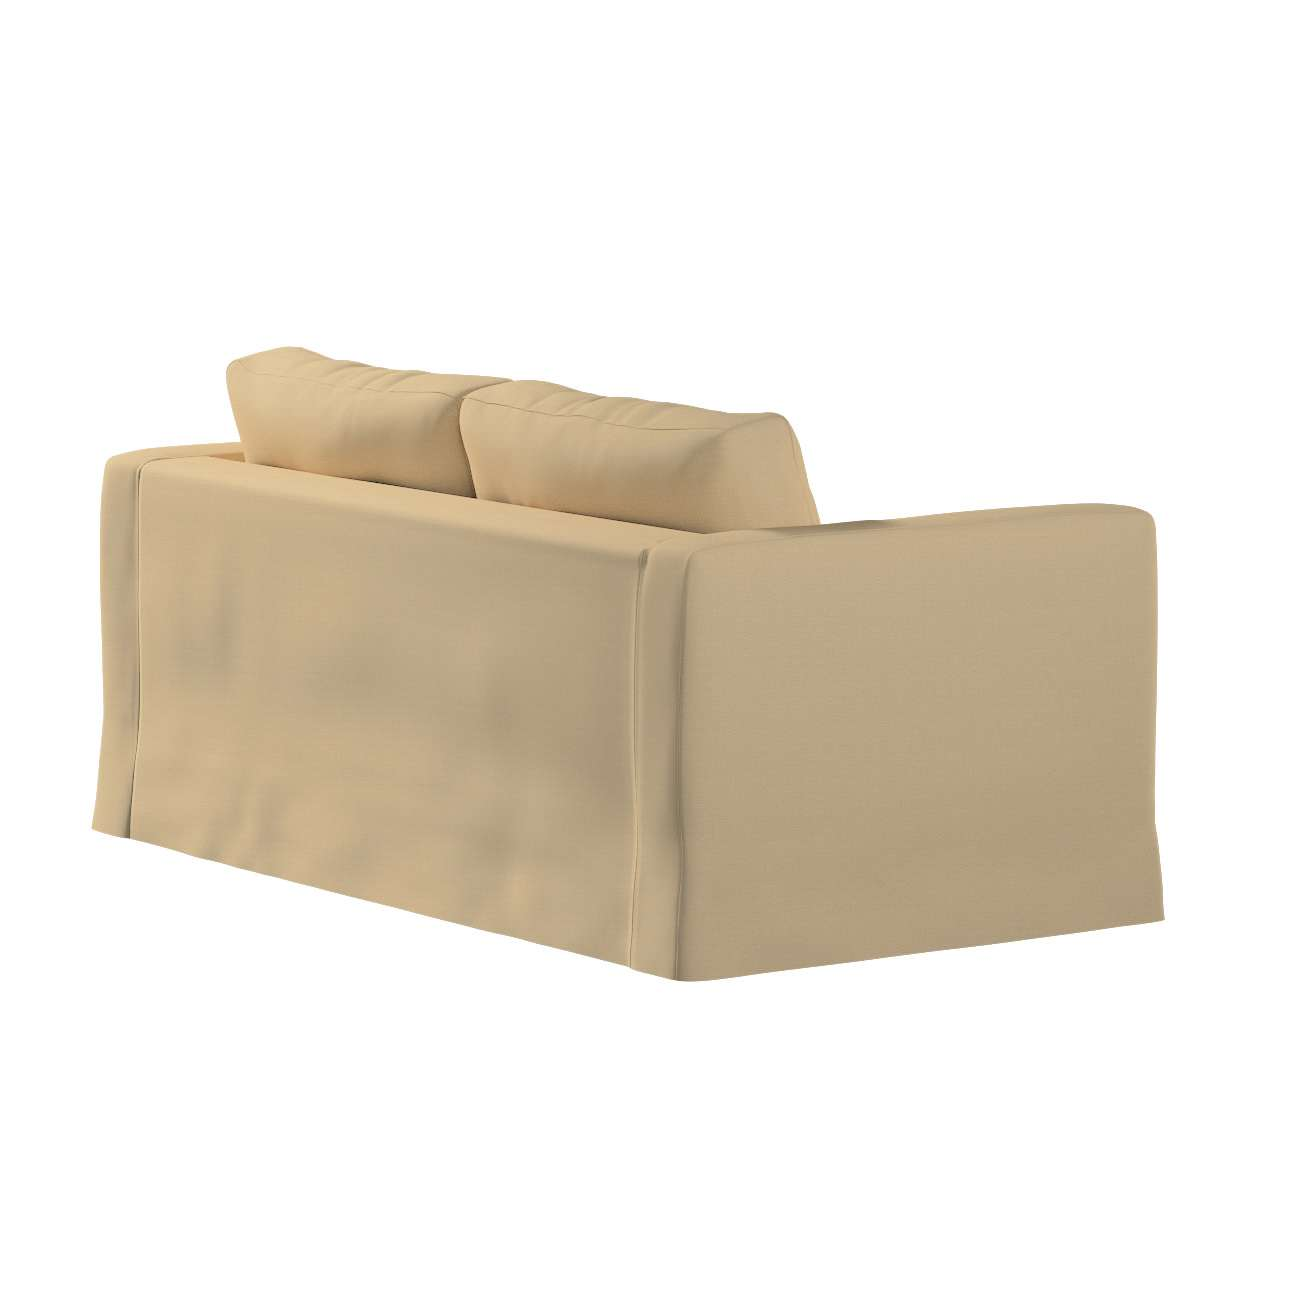 Karlstad klädsel 2-sits soffa -  lång i kollektionen Panama Cotton, Tyg: 702-01